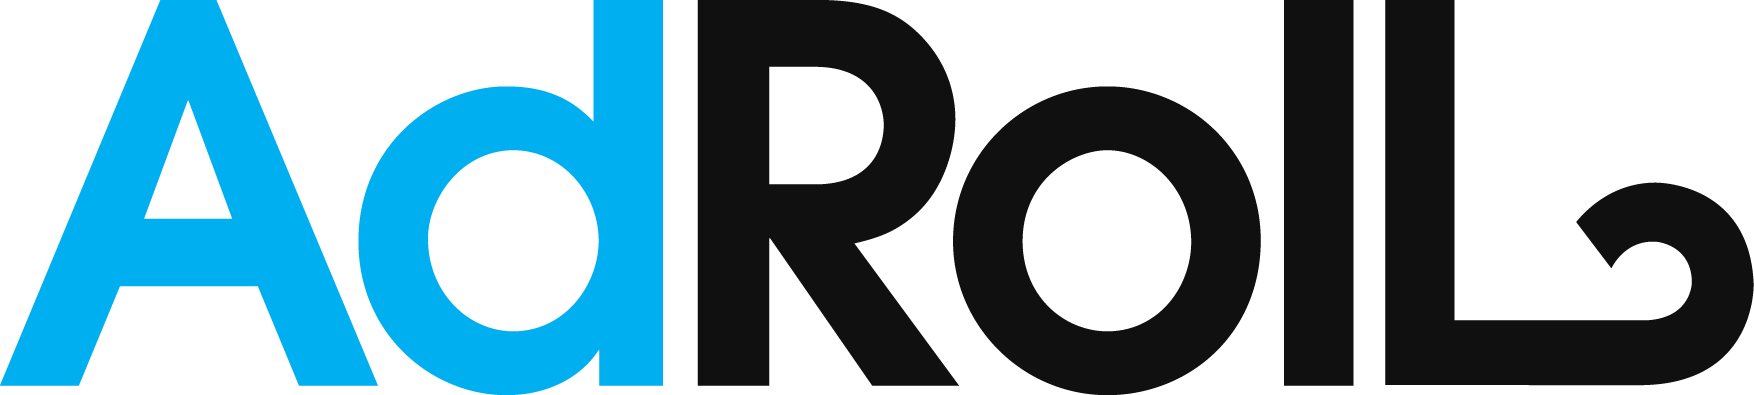 adroll-logo-png-adroll-logo-png-1754.png